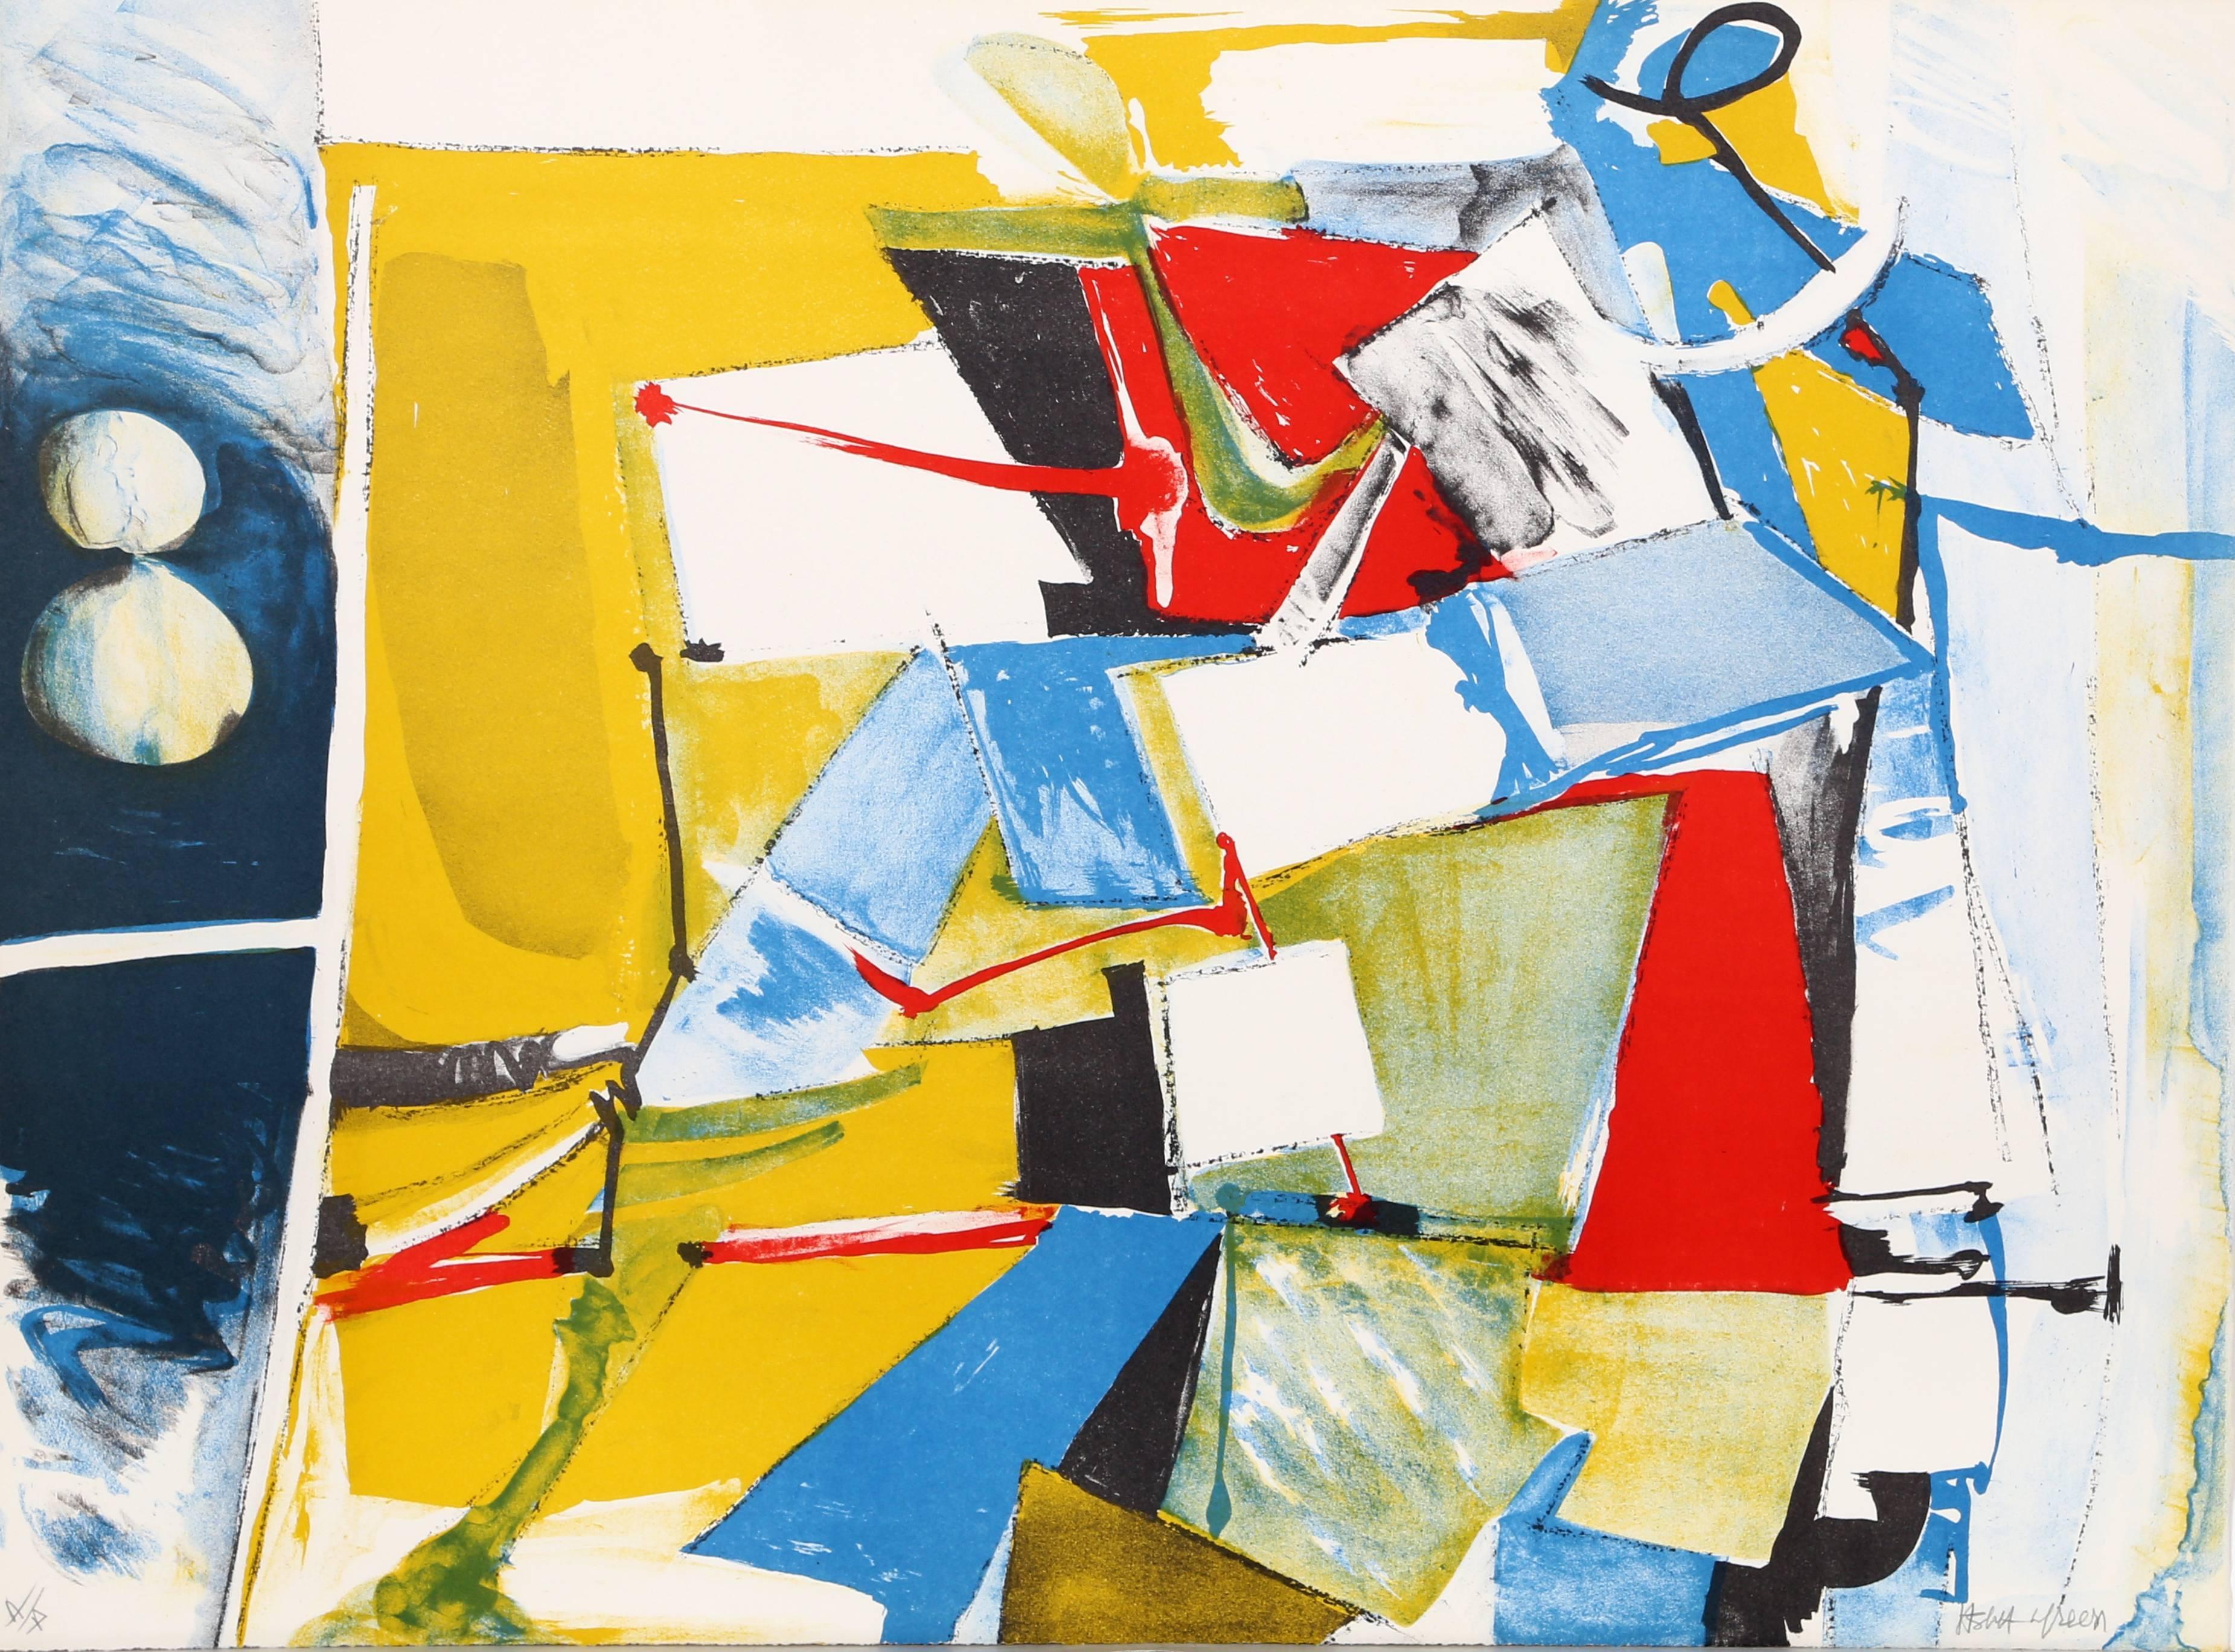 Jasha Green, Abstract 9 Lithograph, circa 1976